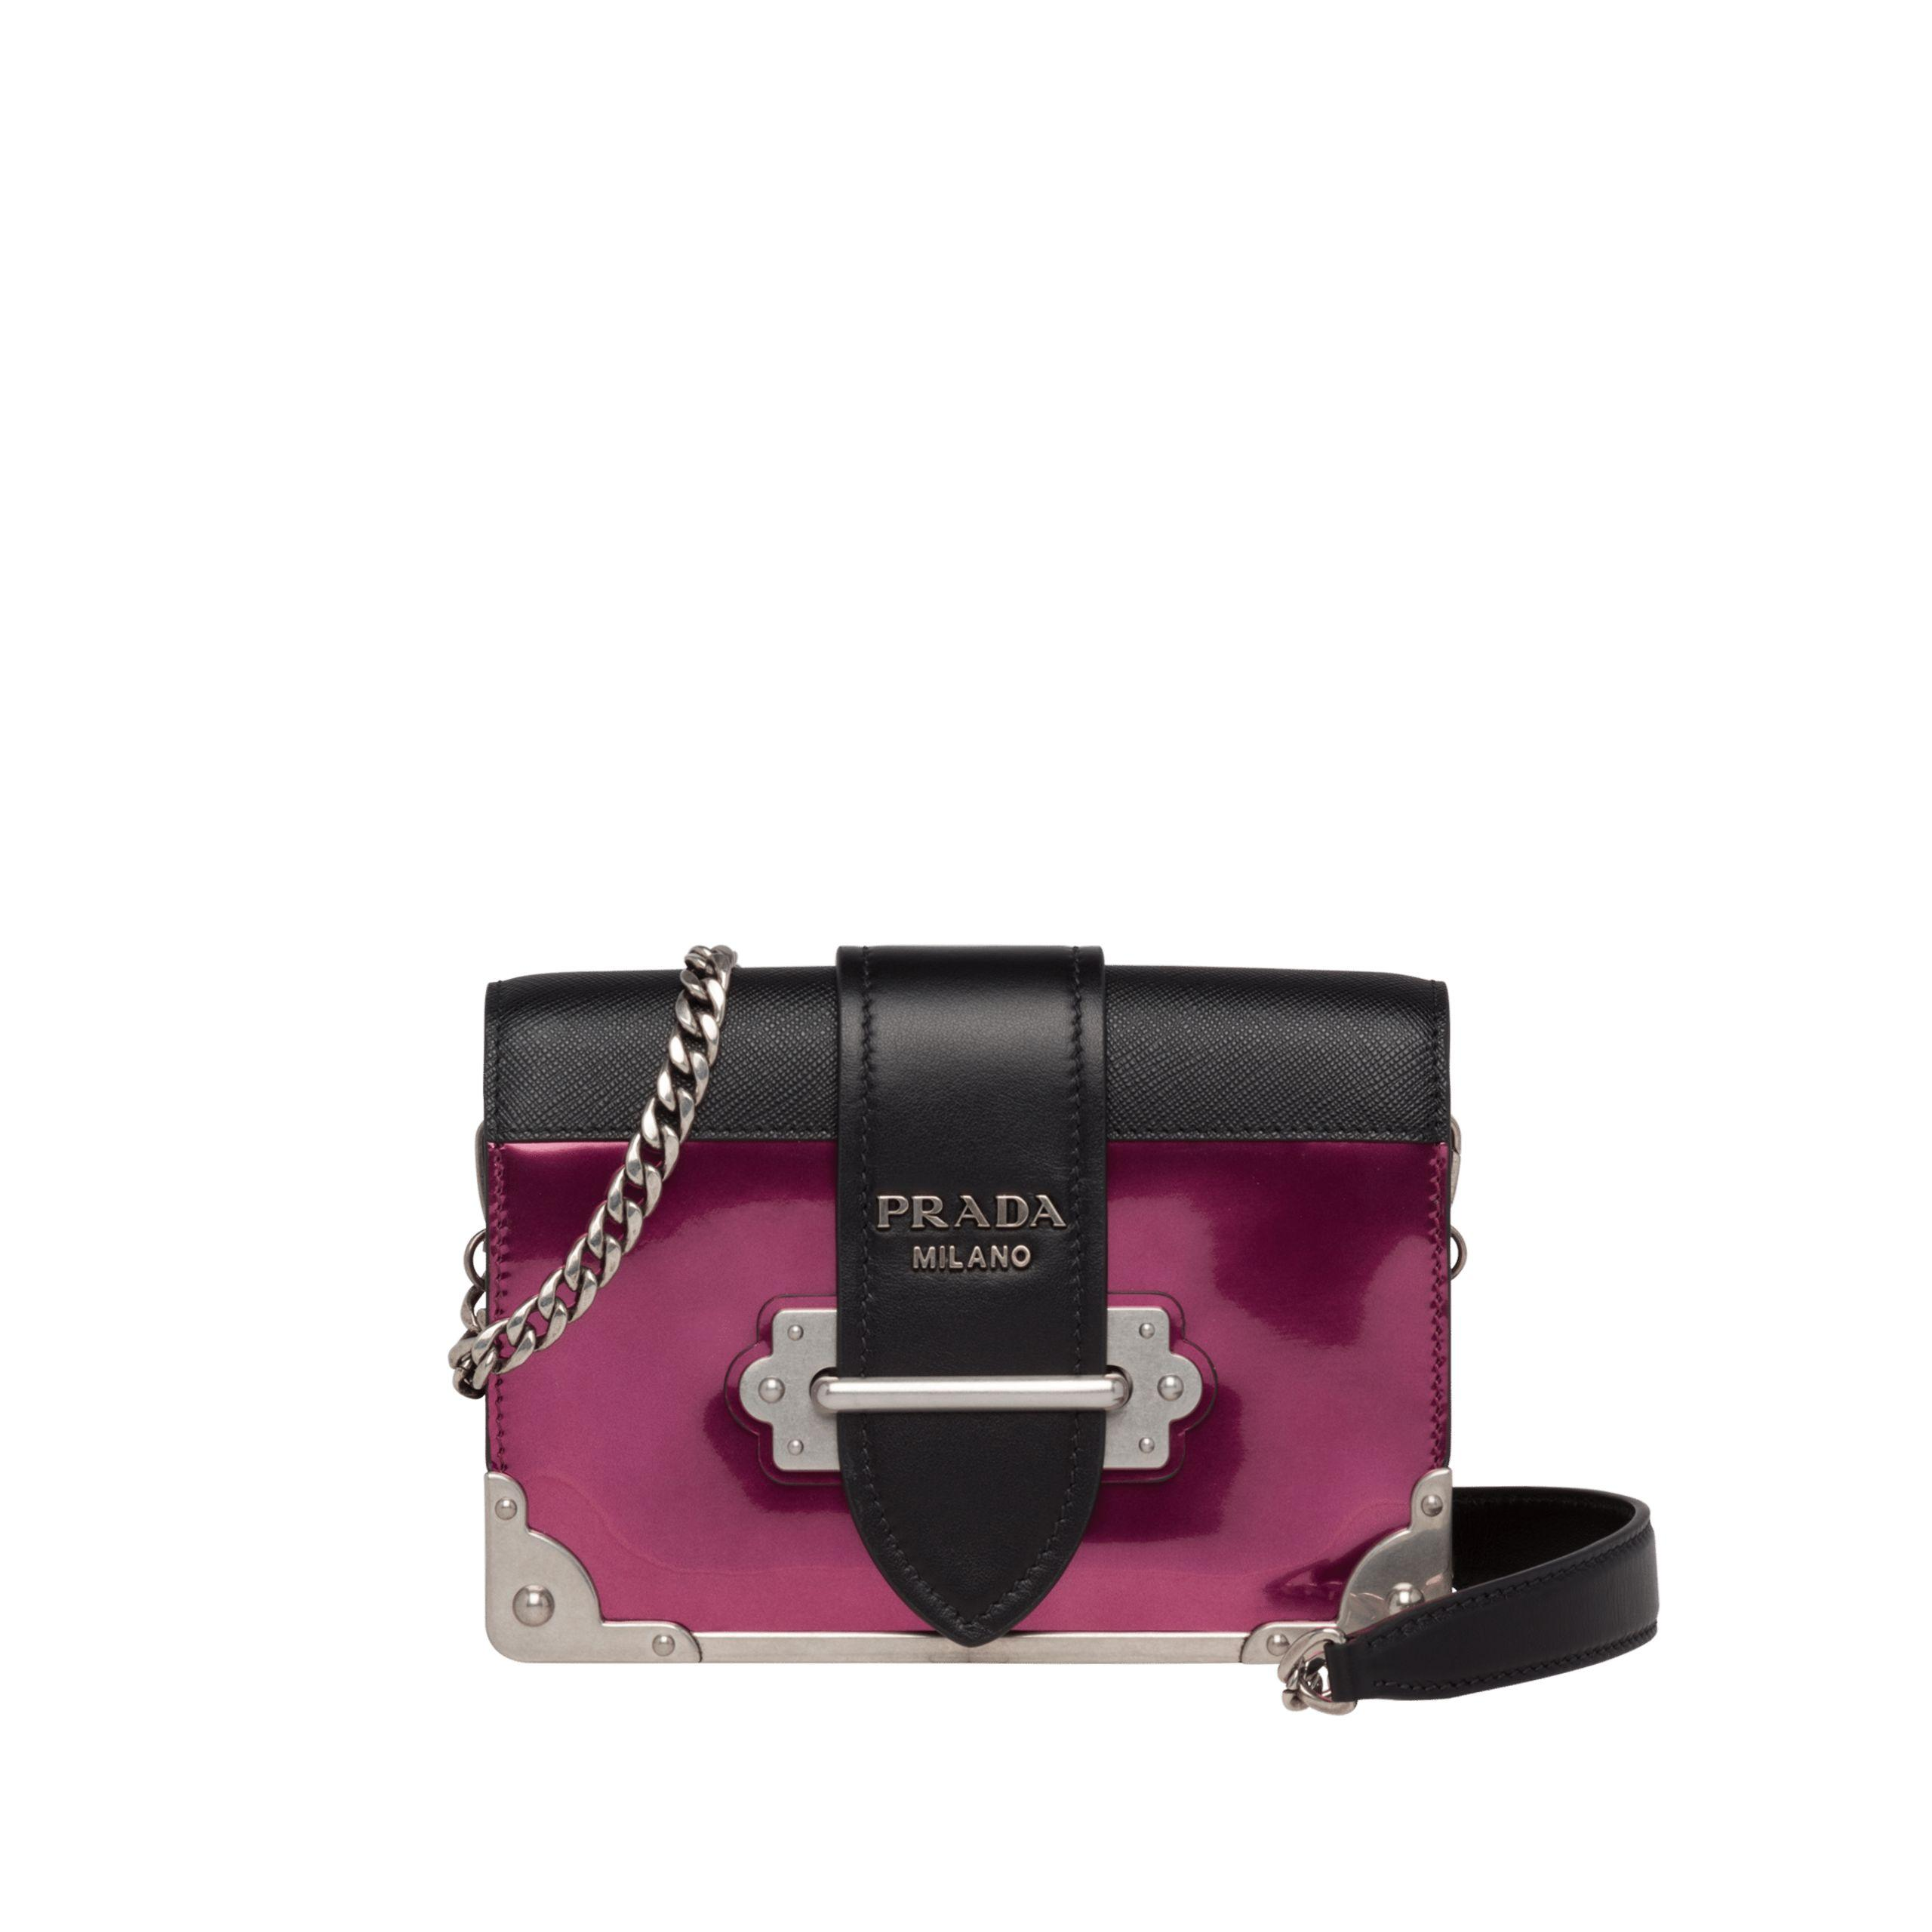 b26b1f9cb101 Prada. Women's Cahier Leather Shoulder Bag